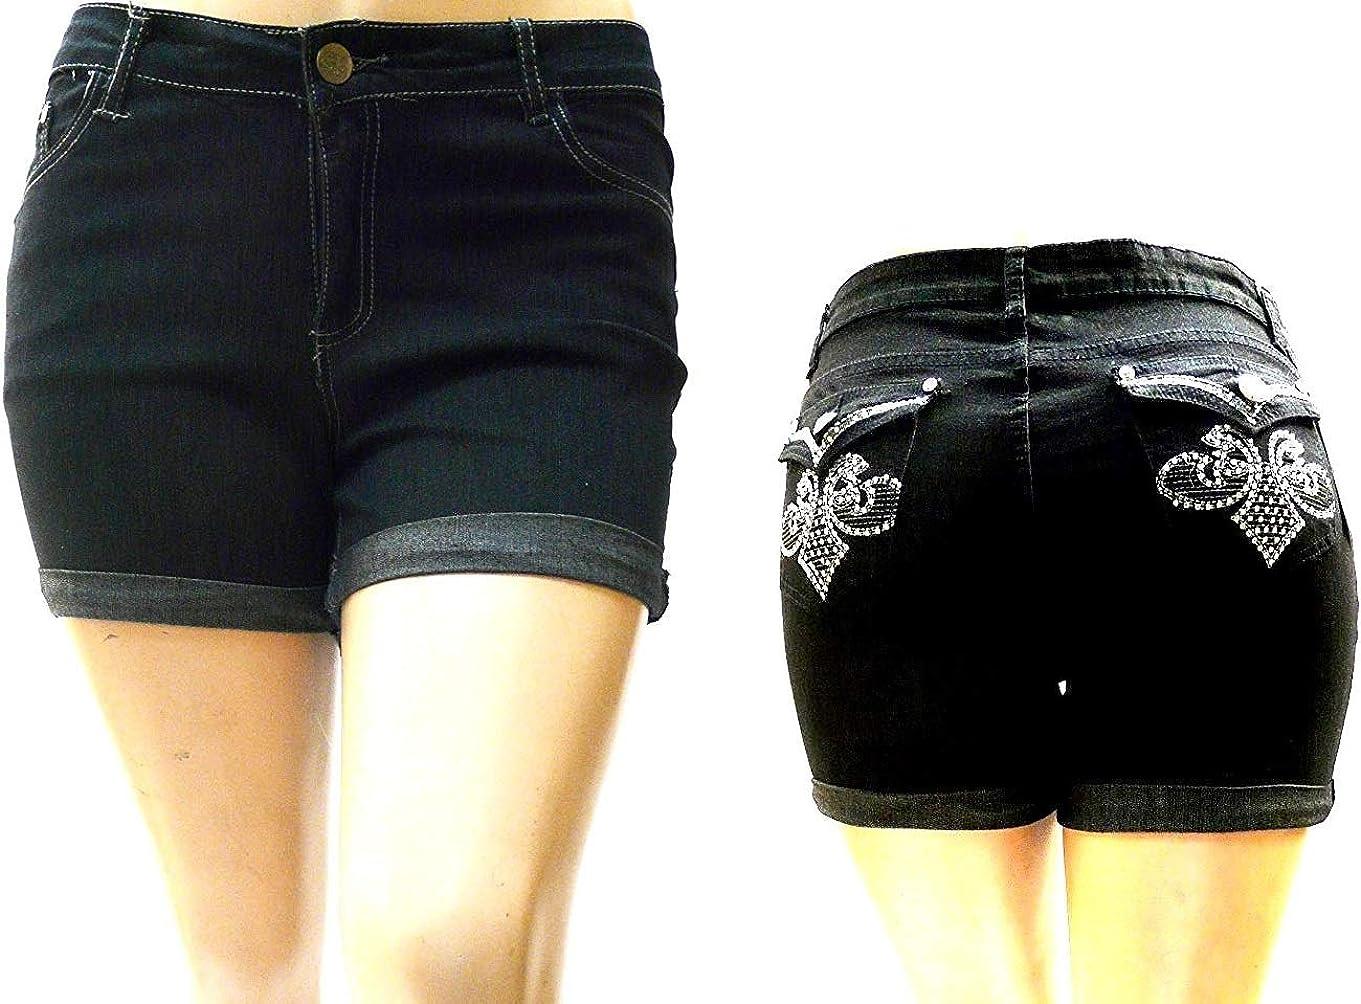 1826 Women's Plus Size Stretchy HI Waist Denim Jeans Short Dark Blue & Black